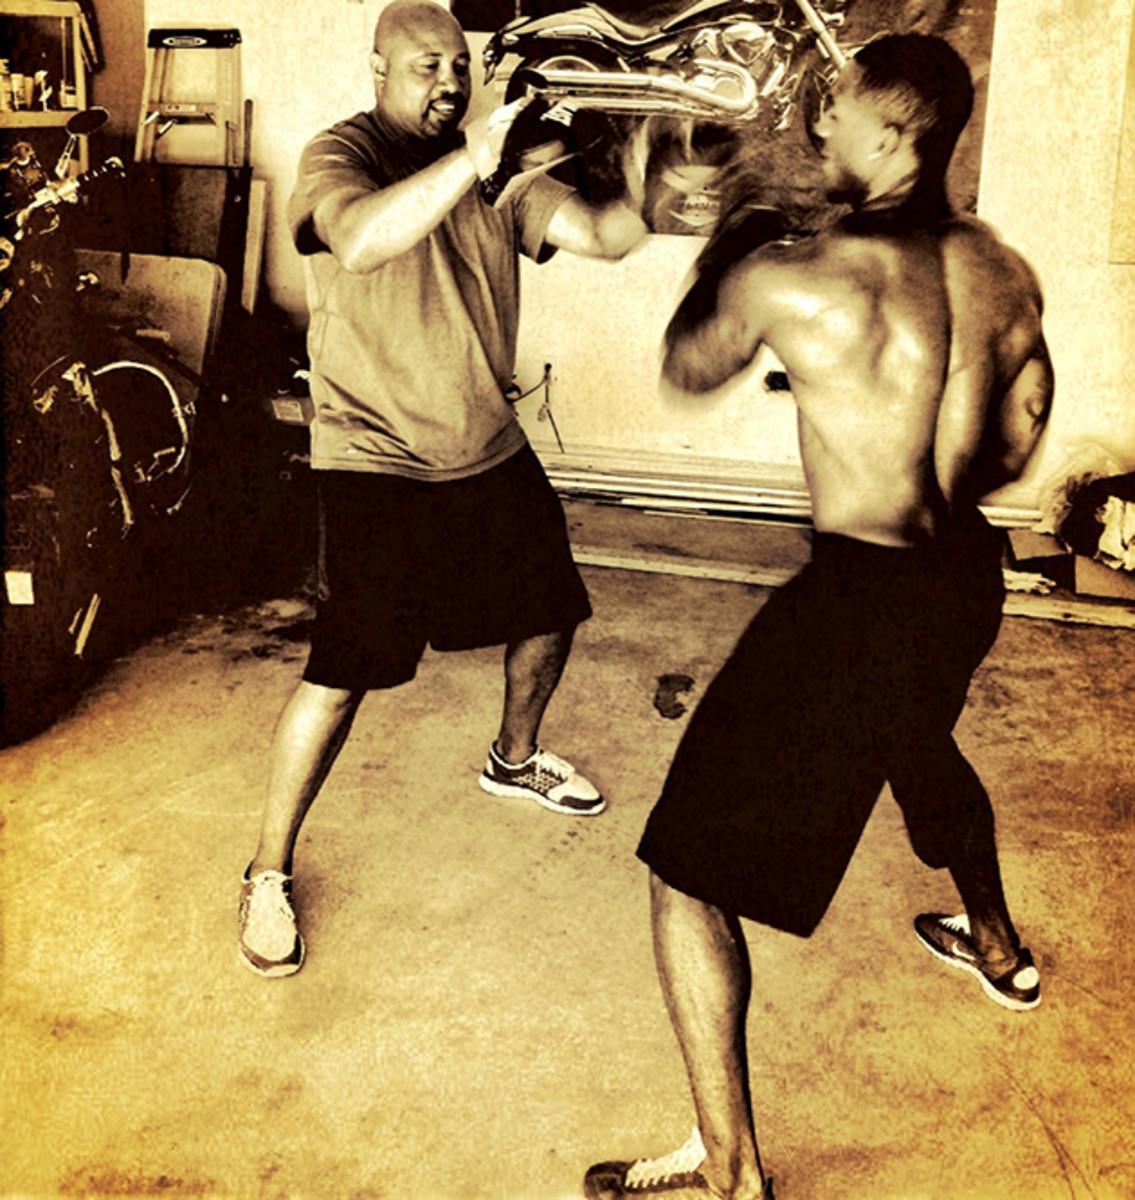 Philadelphia Eagles cornerback Brandon Boykin working out with his trainer.